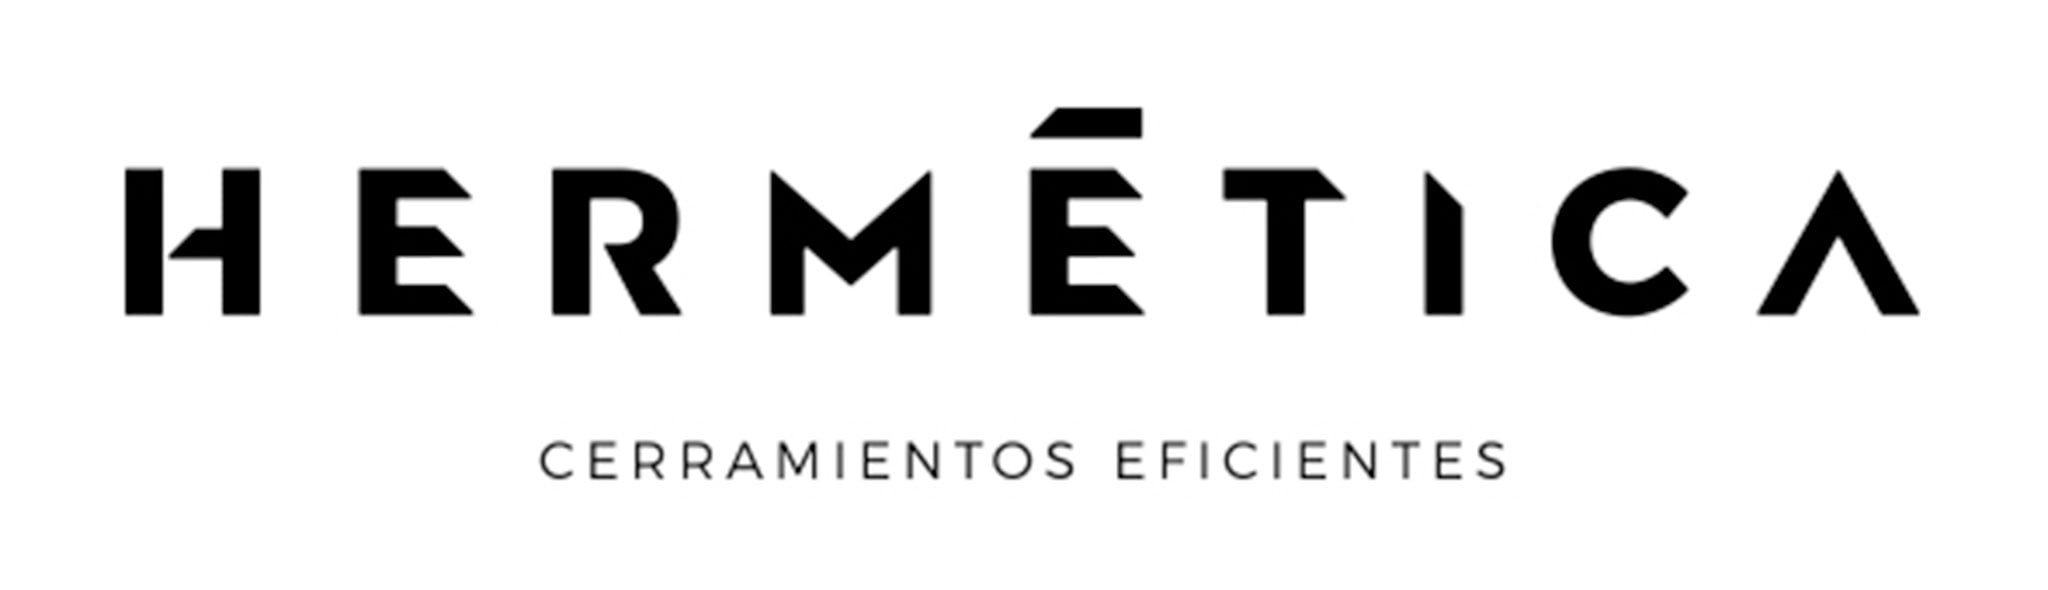 Hermetic logo